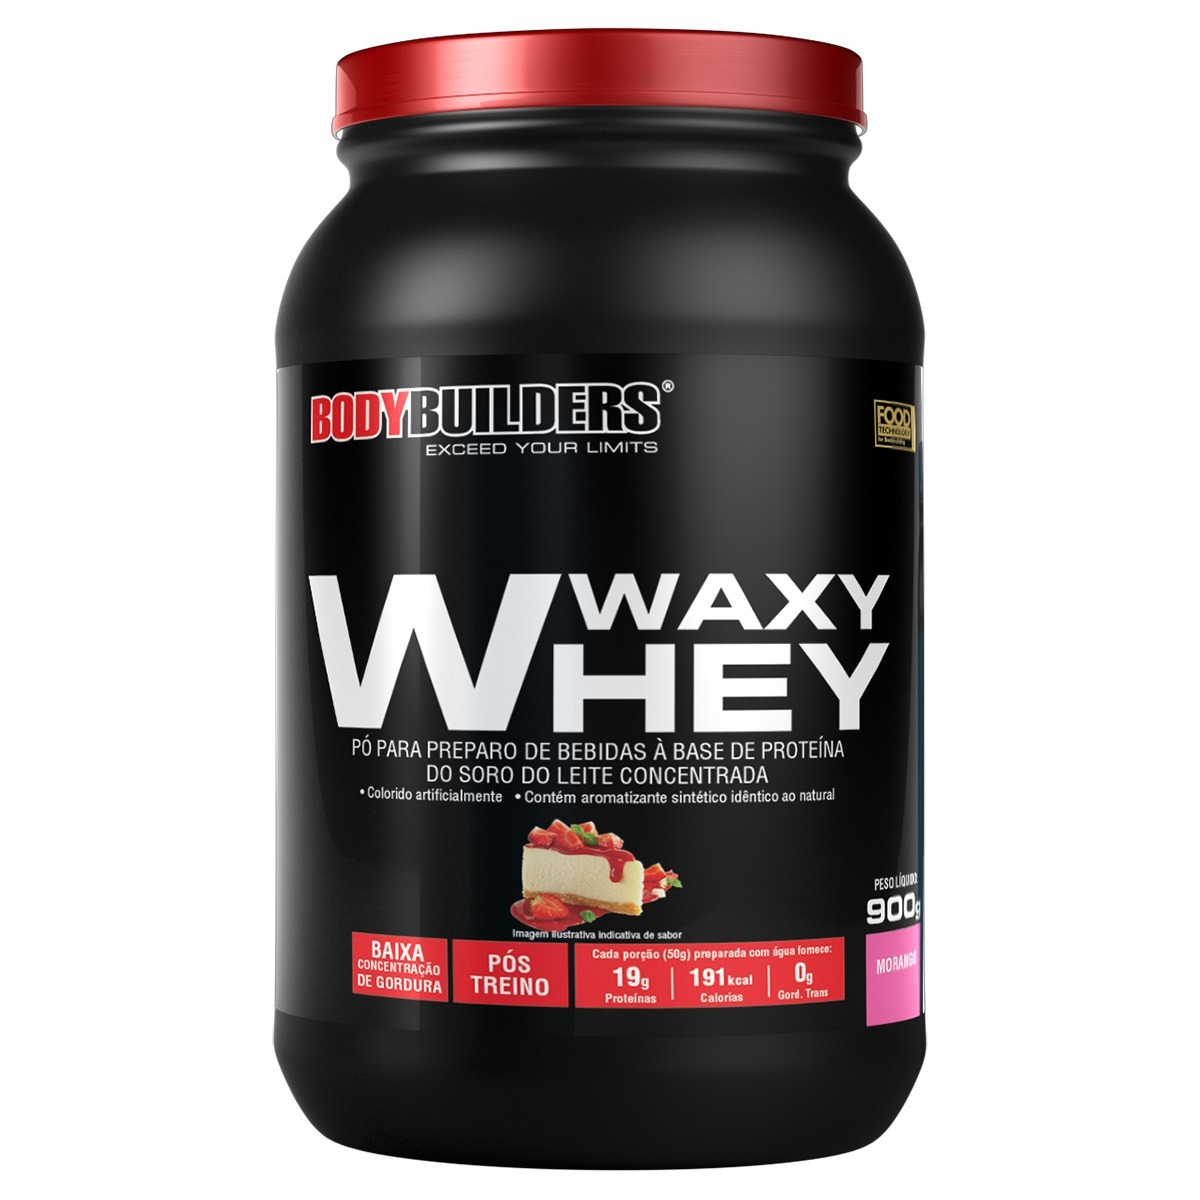 dc4ffcf9c waxy whey protein 900g - bodybuilders. Carregando zoom.